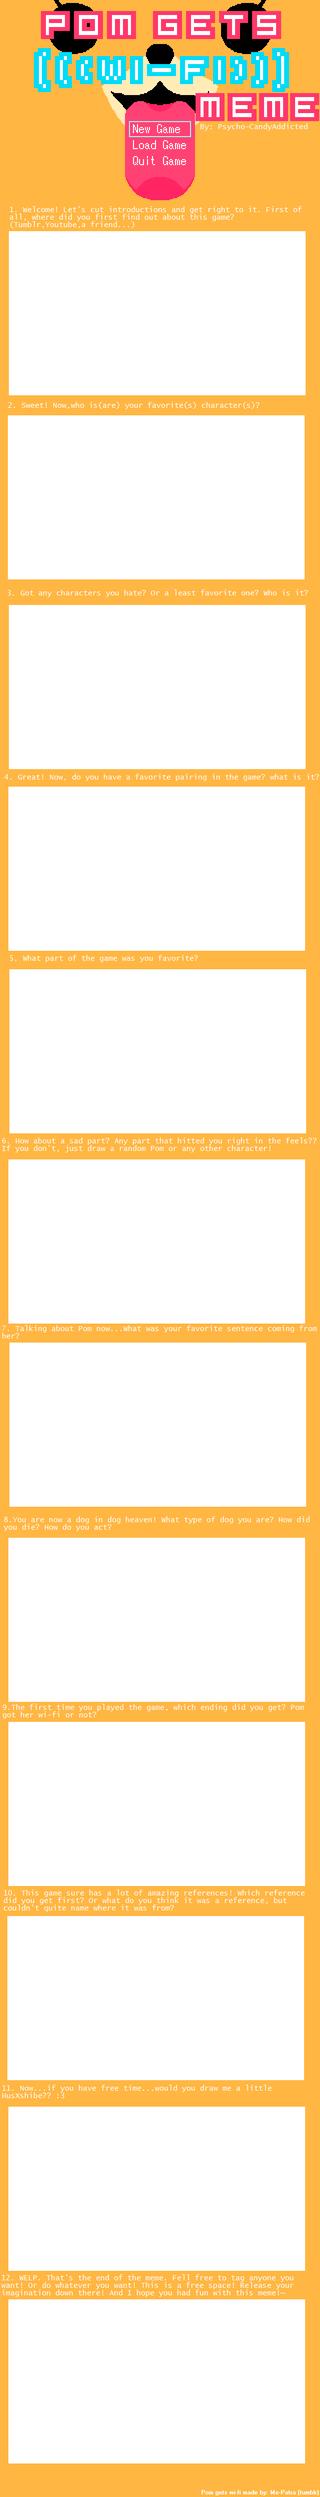 Pom Gets Wi-fi Meme (Blank) -UPD8 VERSION- by Psycho-CandyAddicted